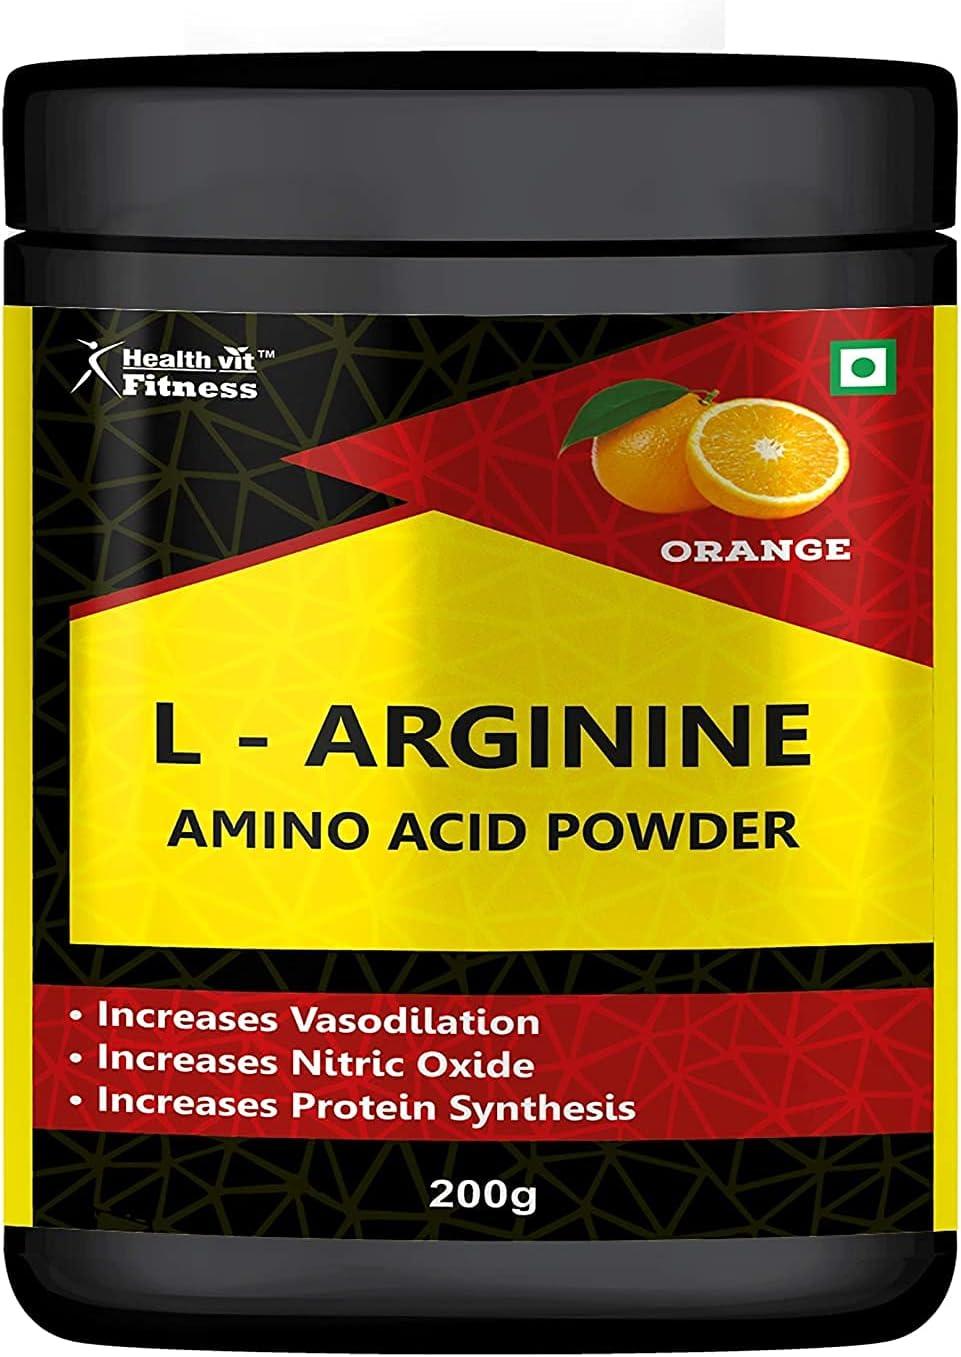 Madow Fitness All items free shipping L-Arginine Amino Store Acid Flavou 200GM - Powder Orange